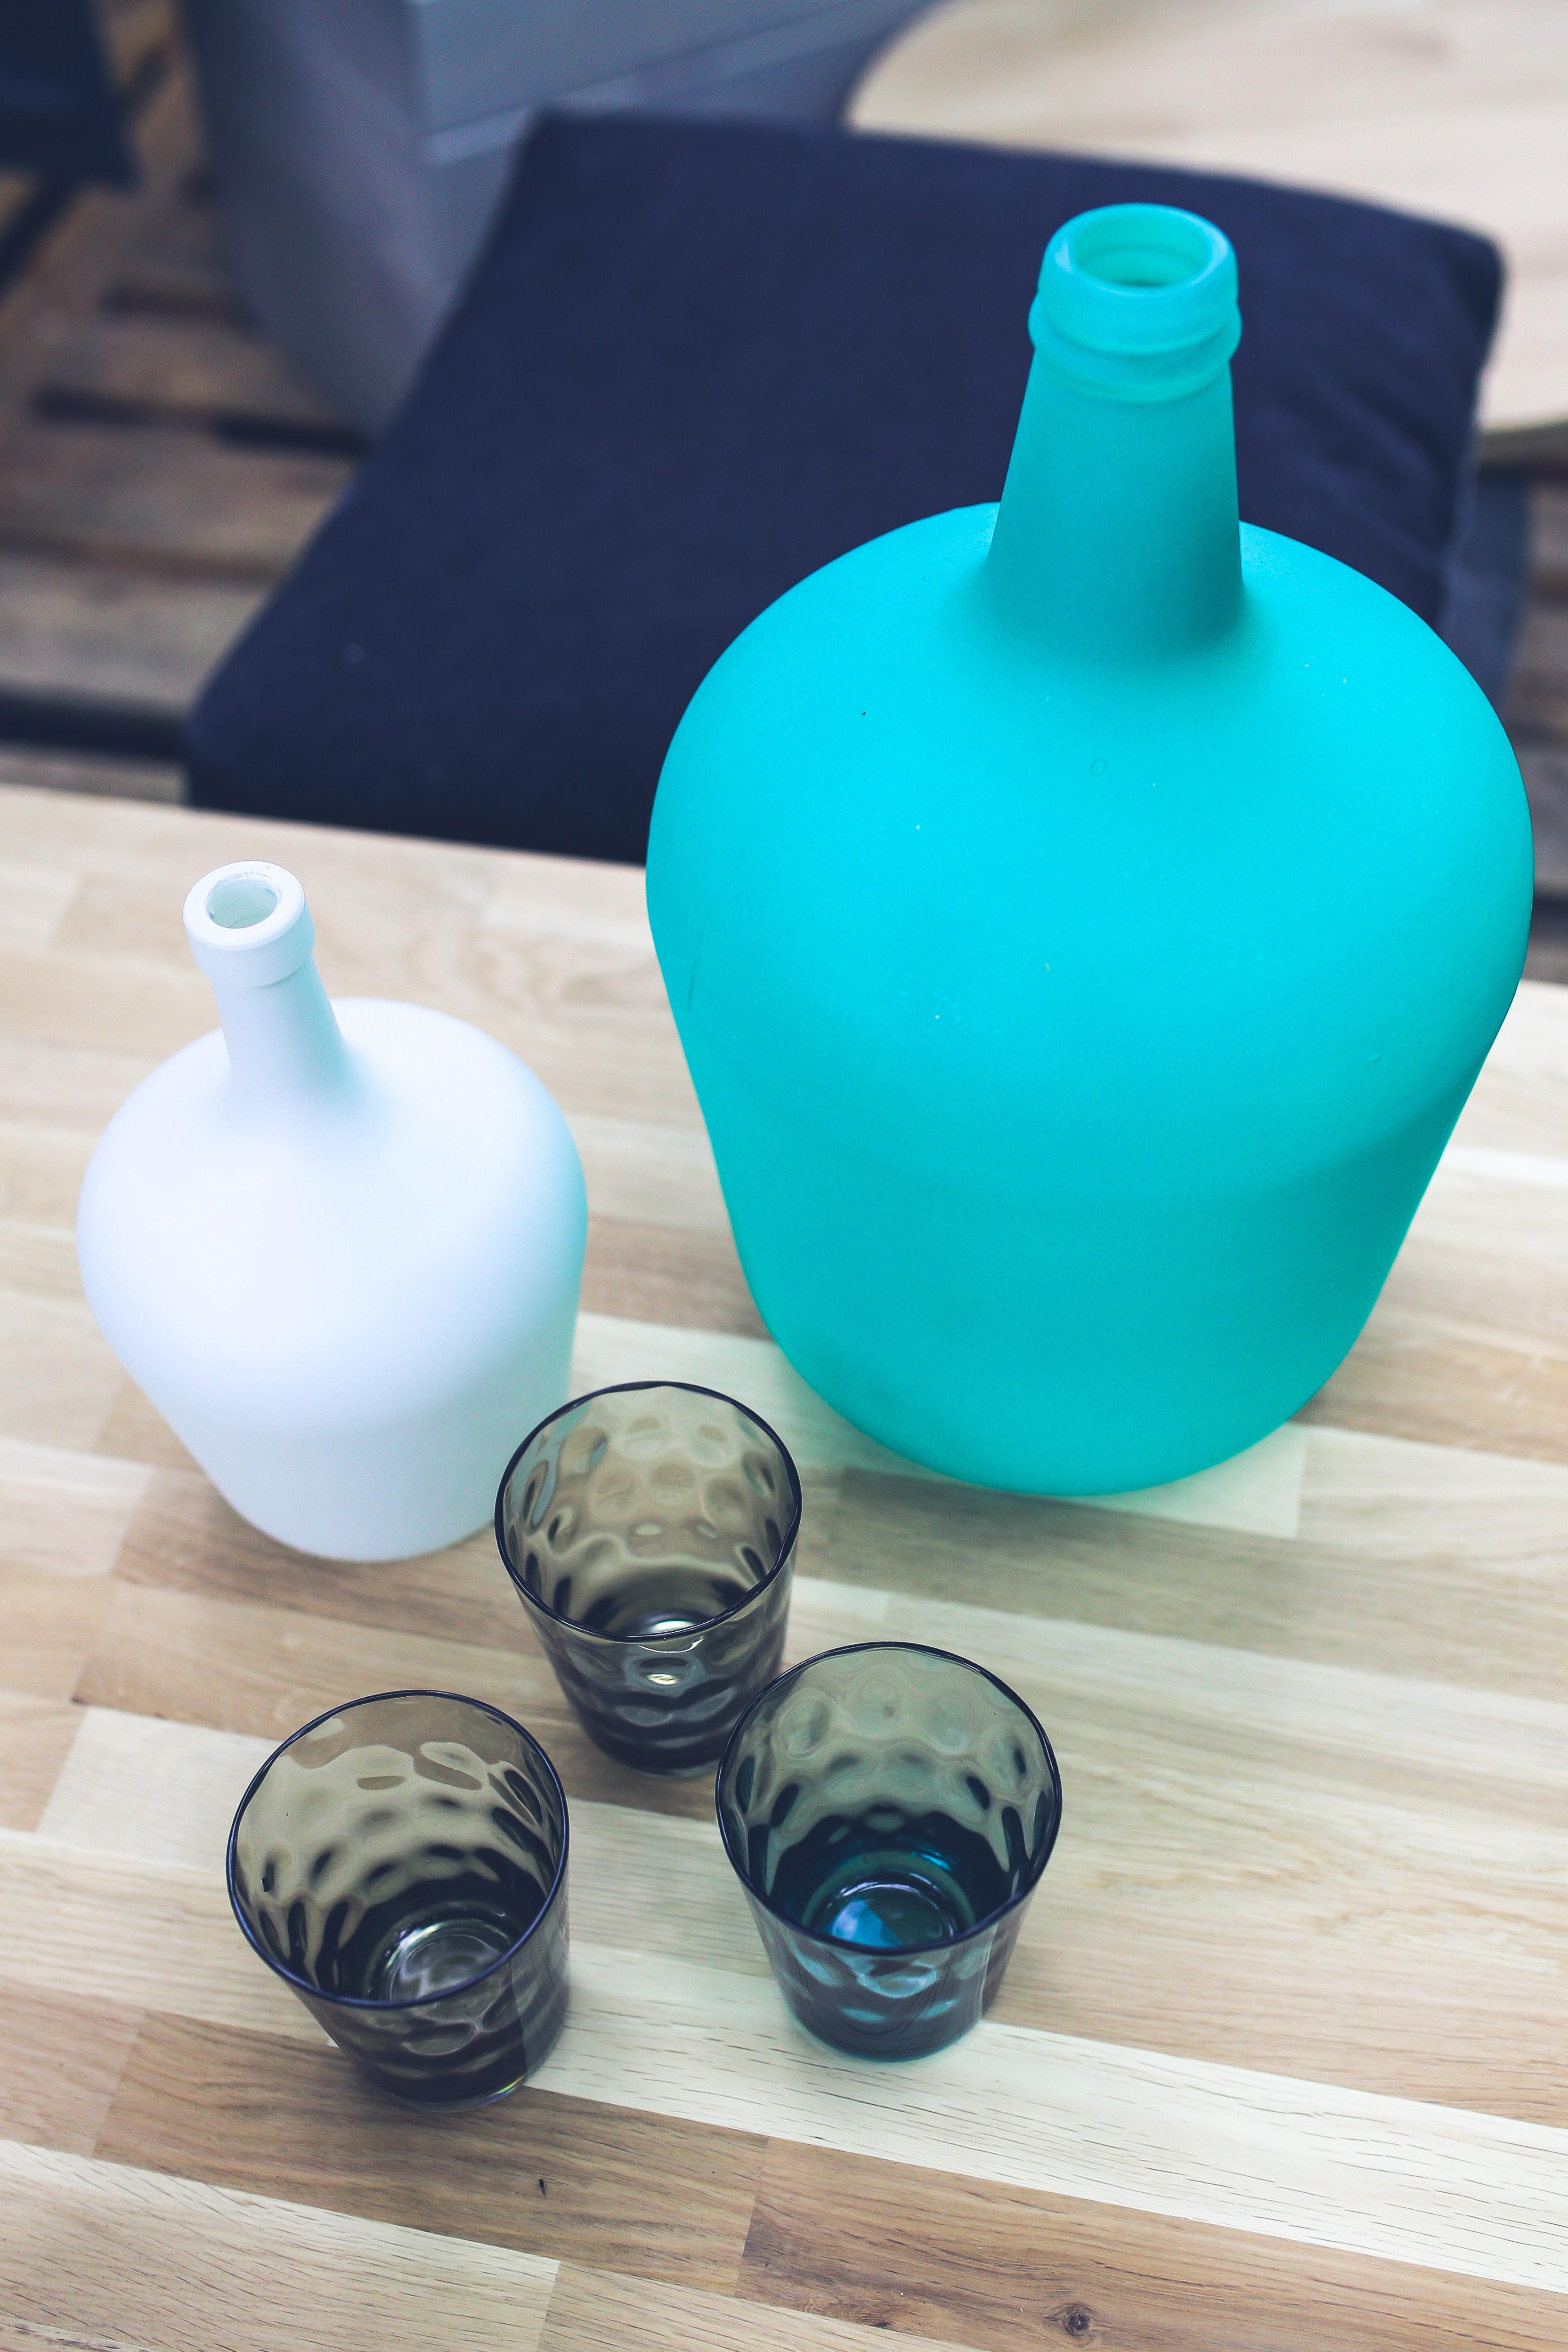 Bottle & glasses, Applied art, Glasses, Wood, White, HQ Photo